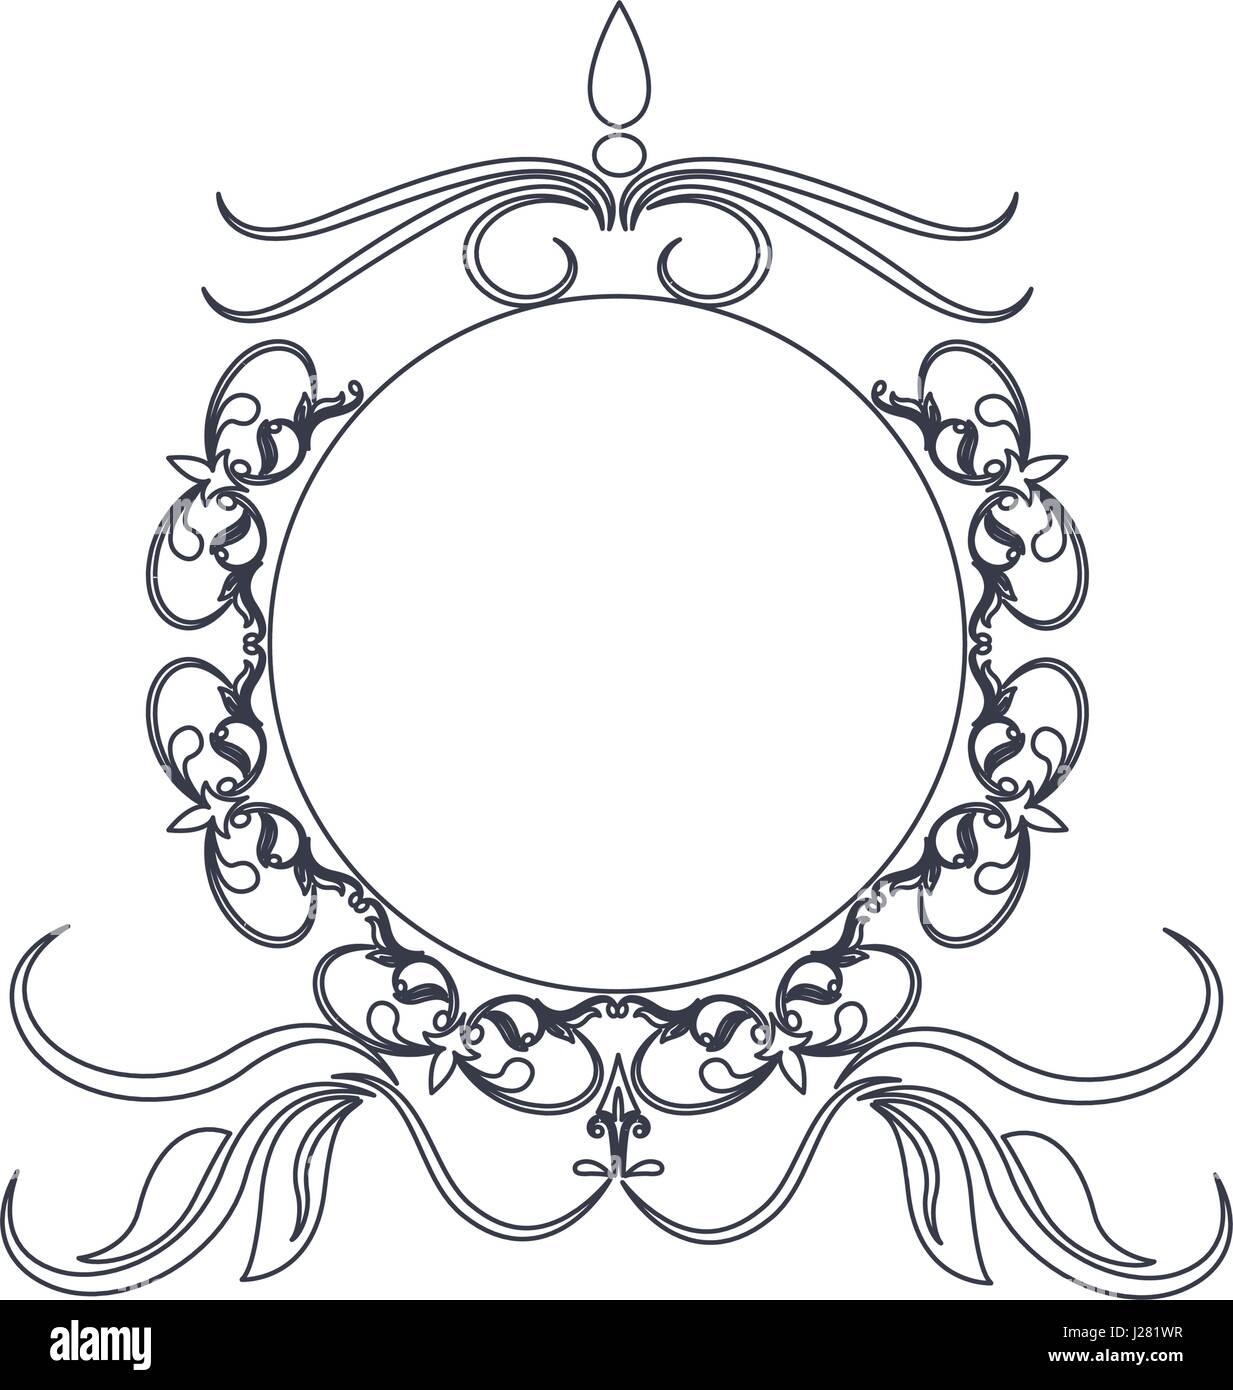 round decorative frame flourish calligraphy monochrome Stock Vector ...